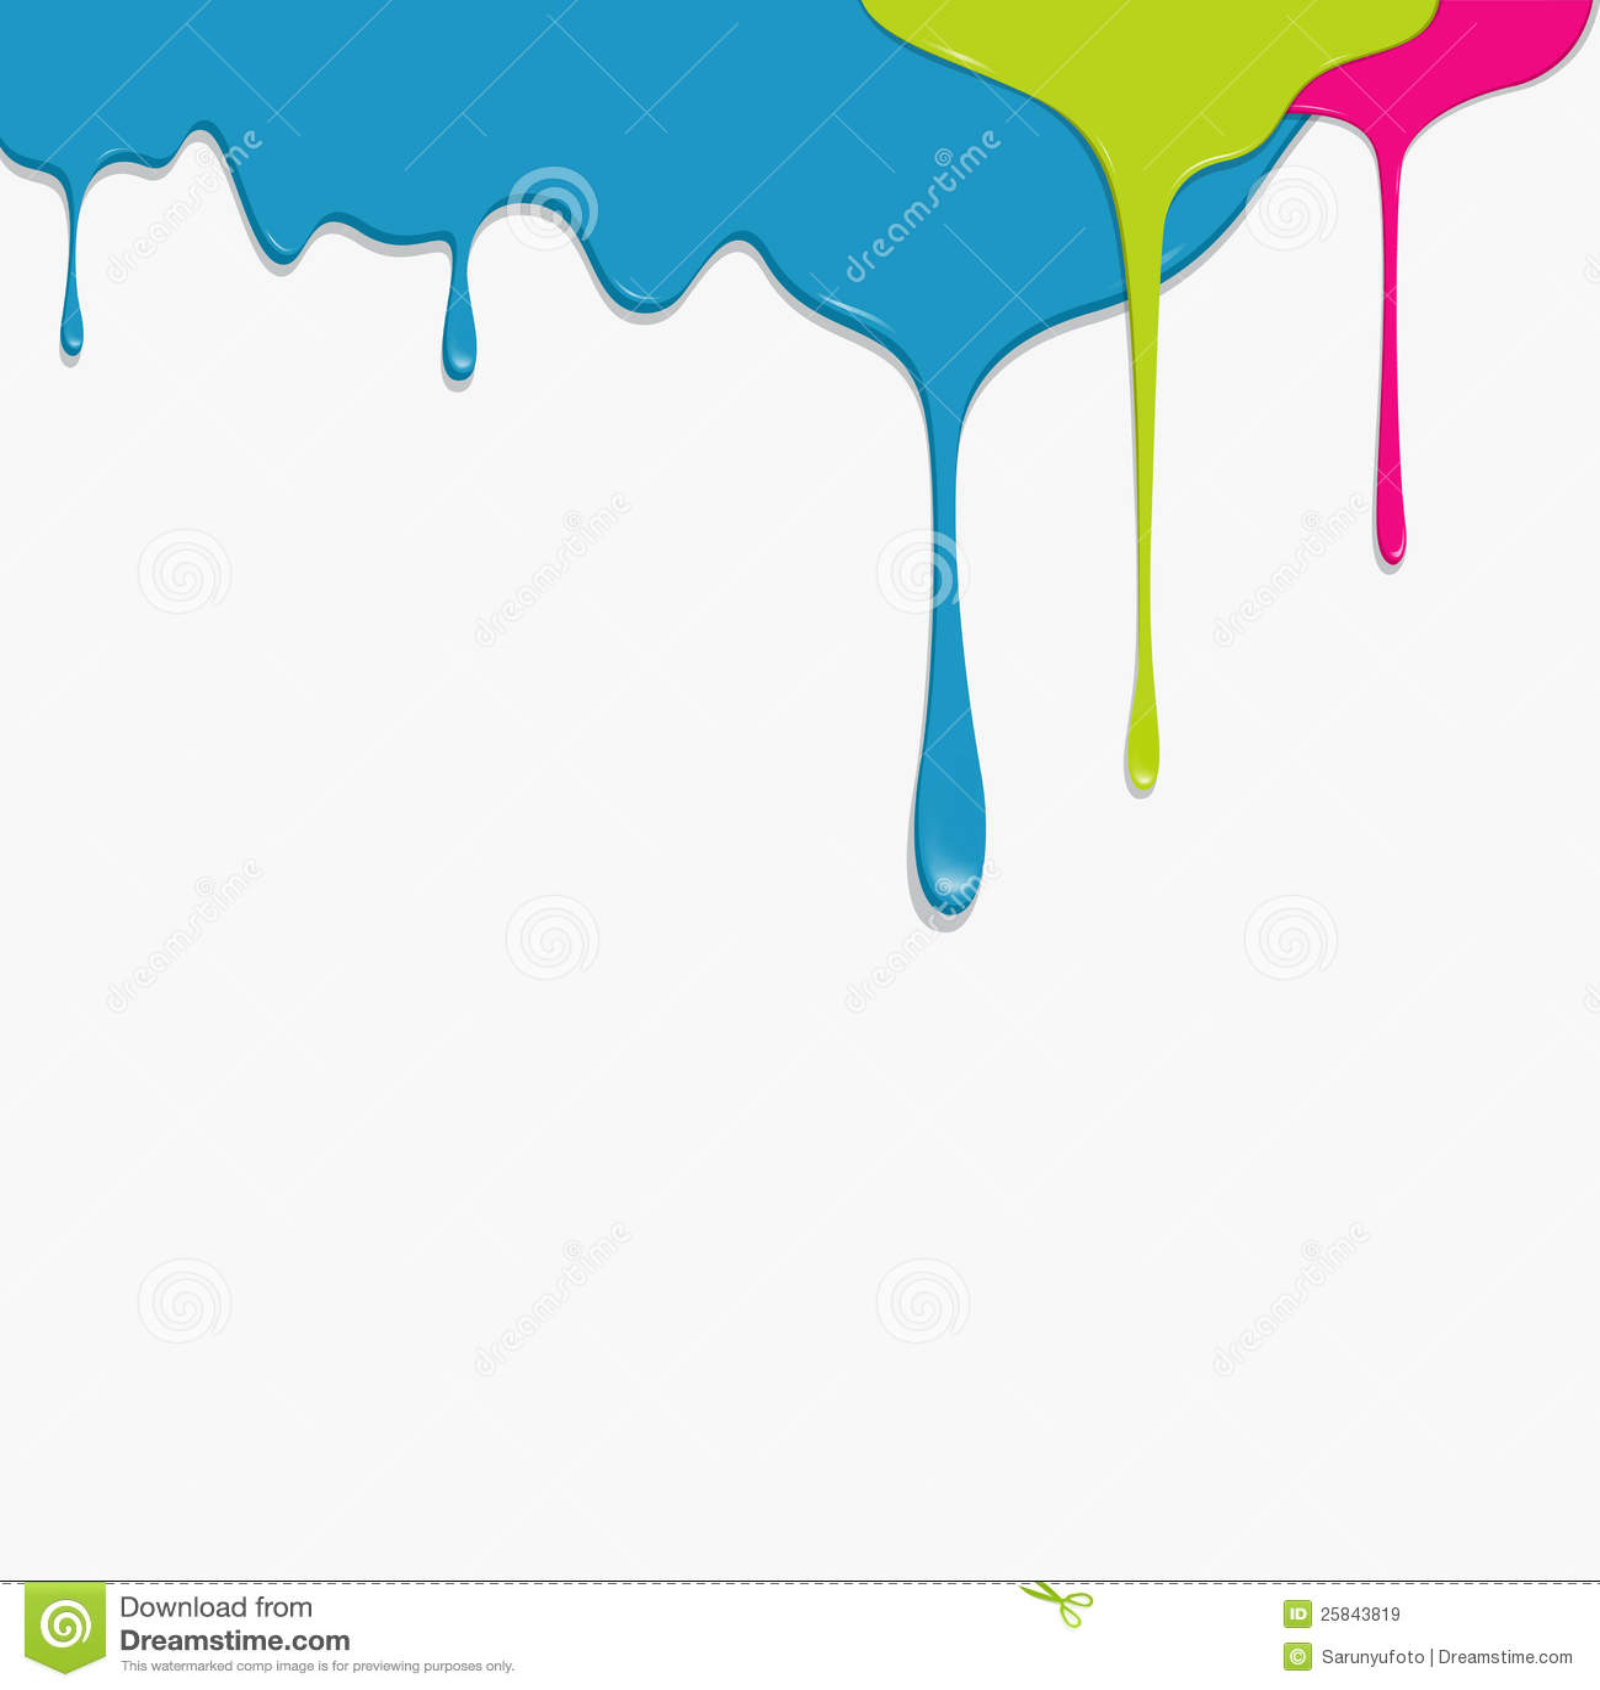 Dripping Blue Paint Cartoon